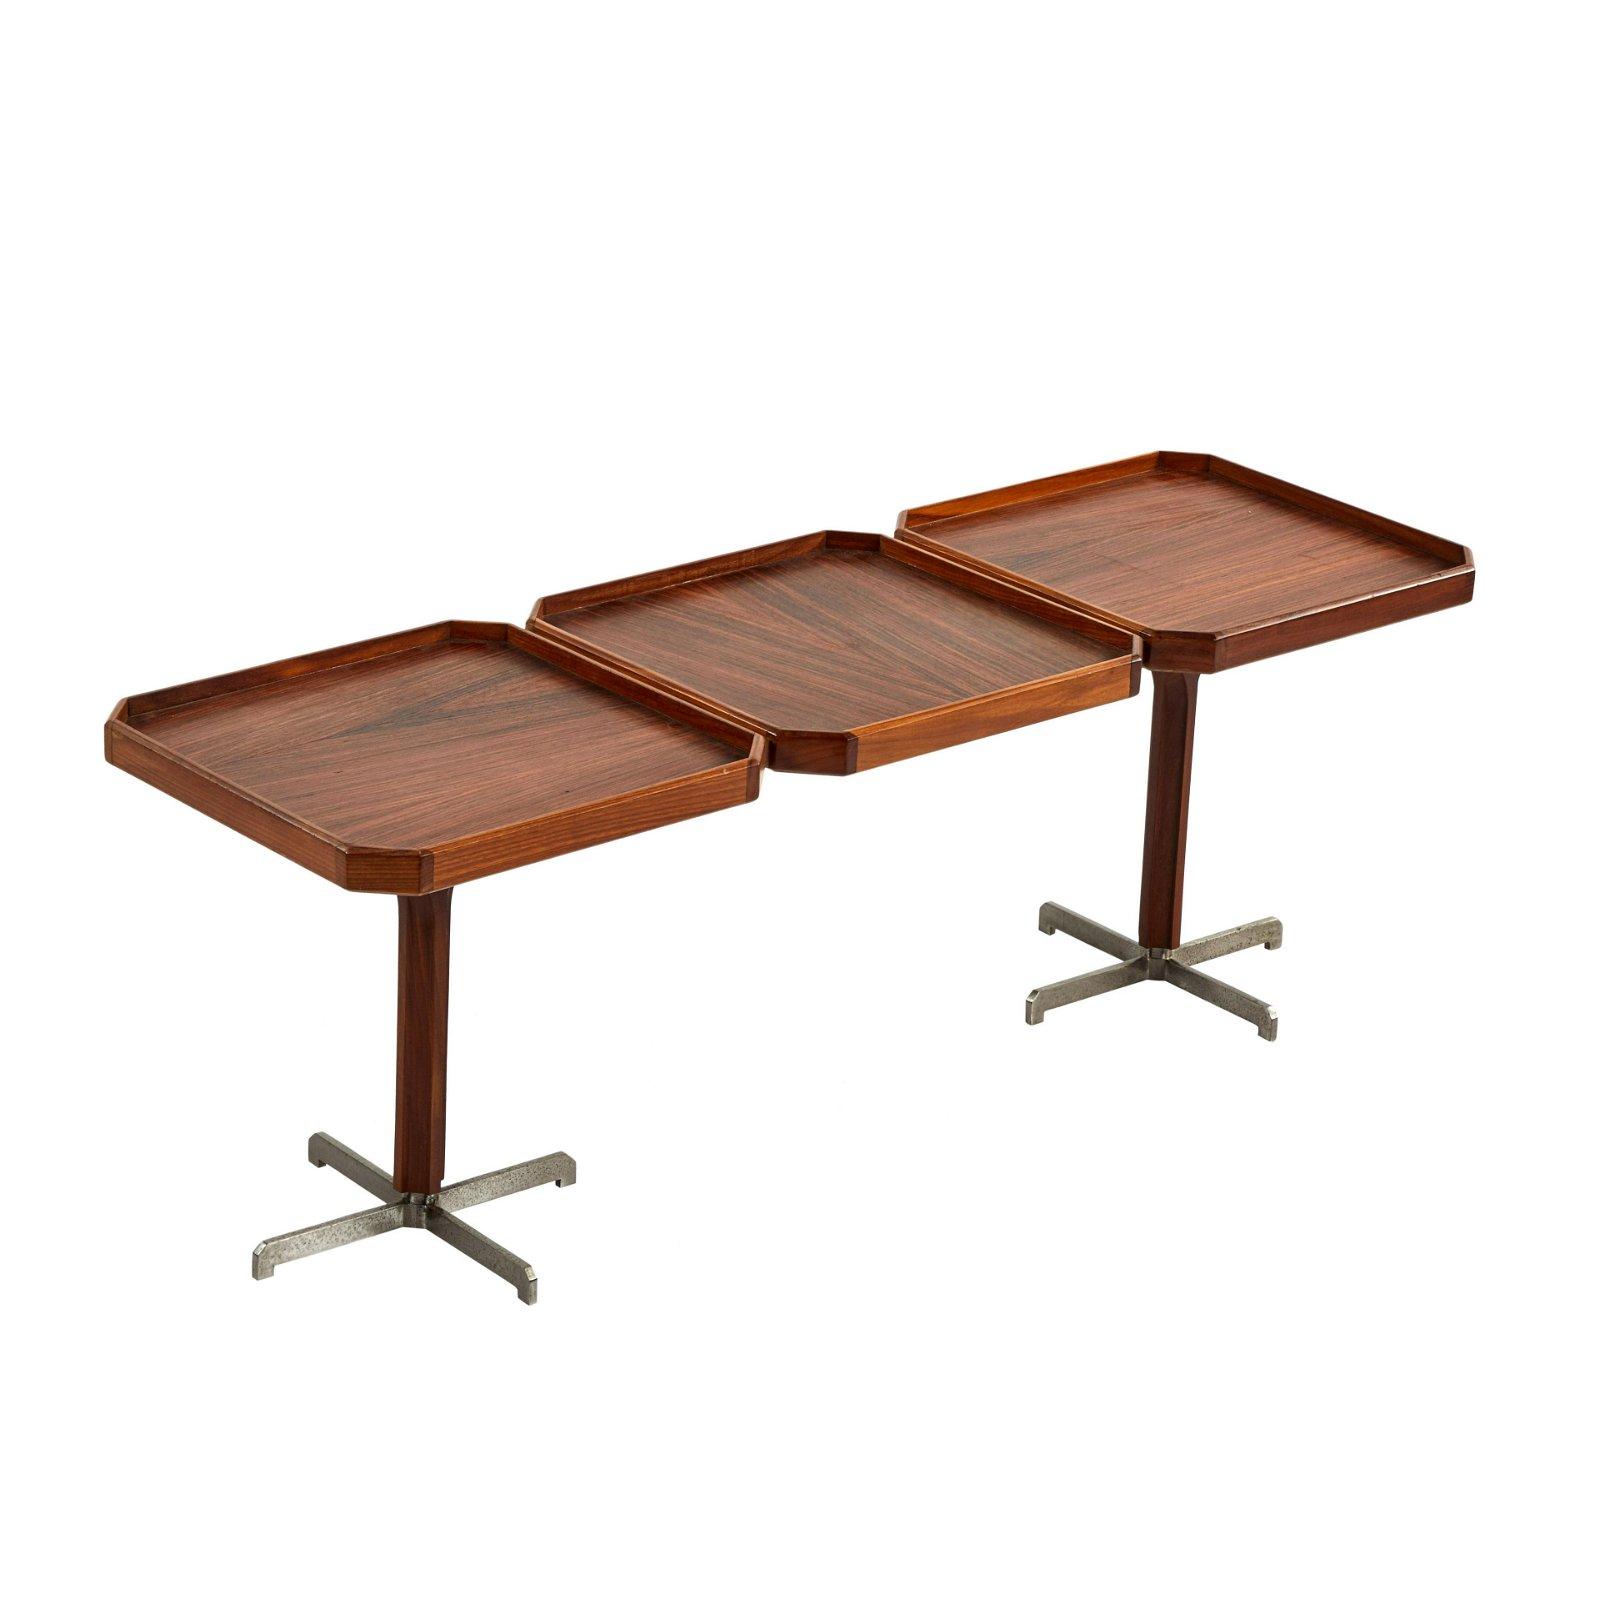 Three-Tray Coffee Table